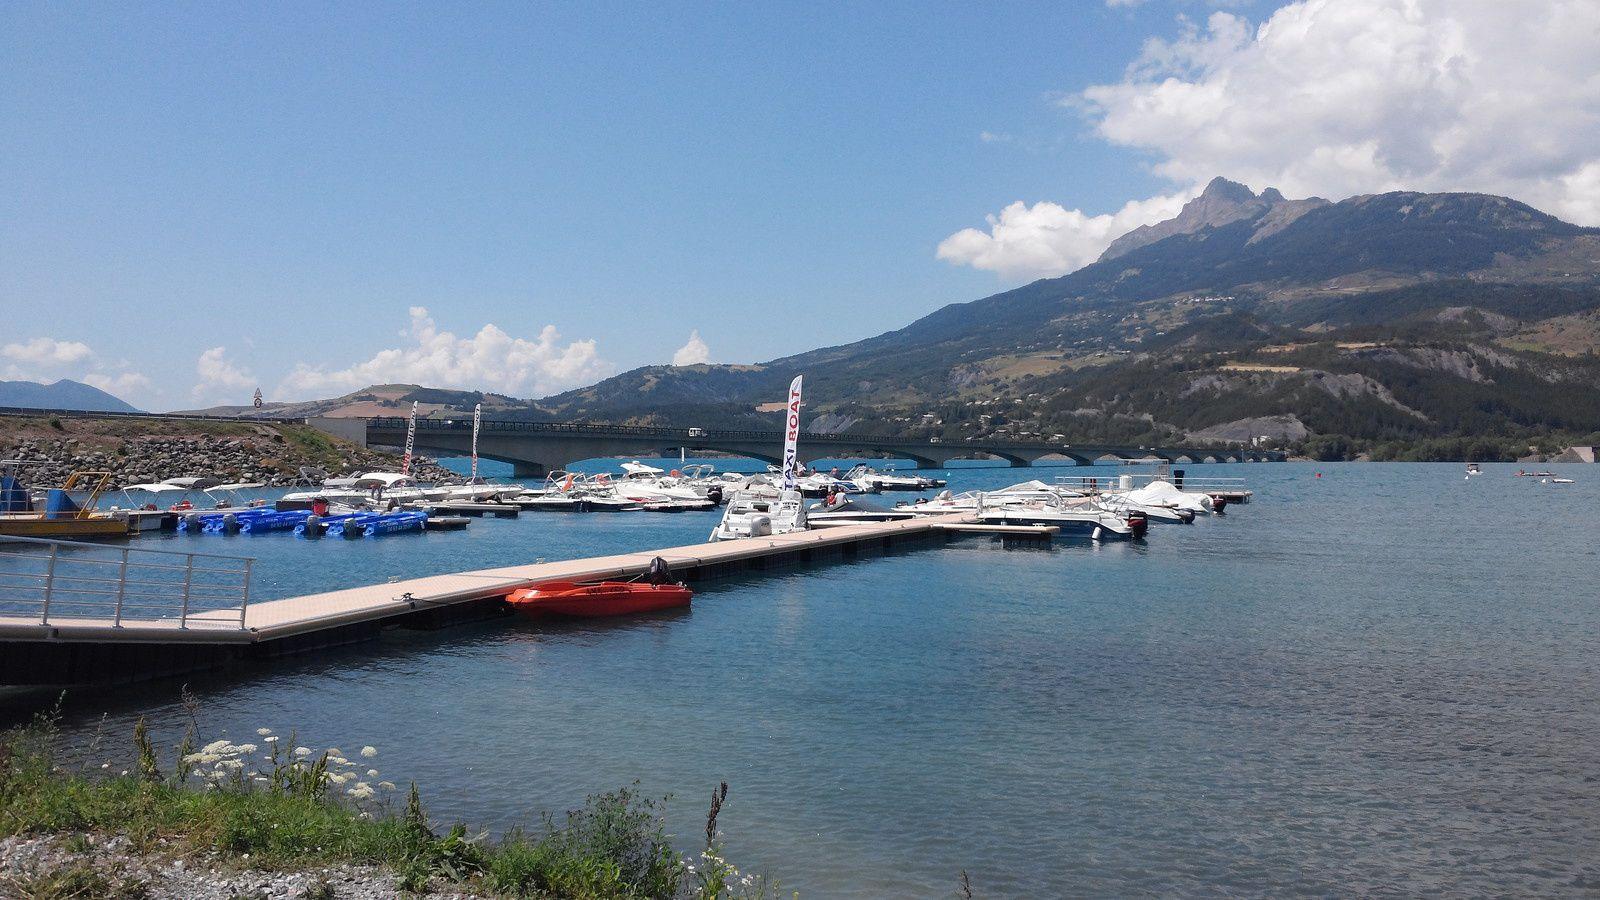 Lac de Serre-Ponçon - Savines le Lac - Embrun - Barrage EDF